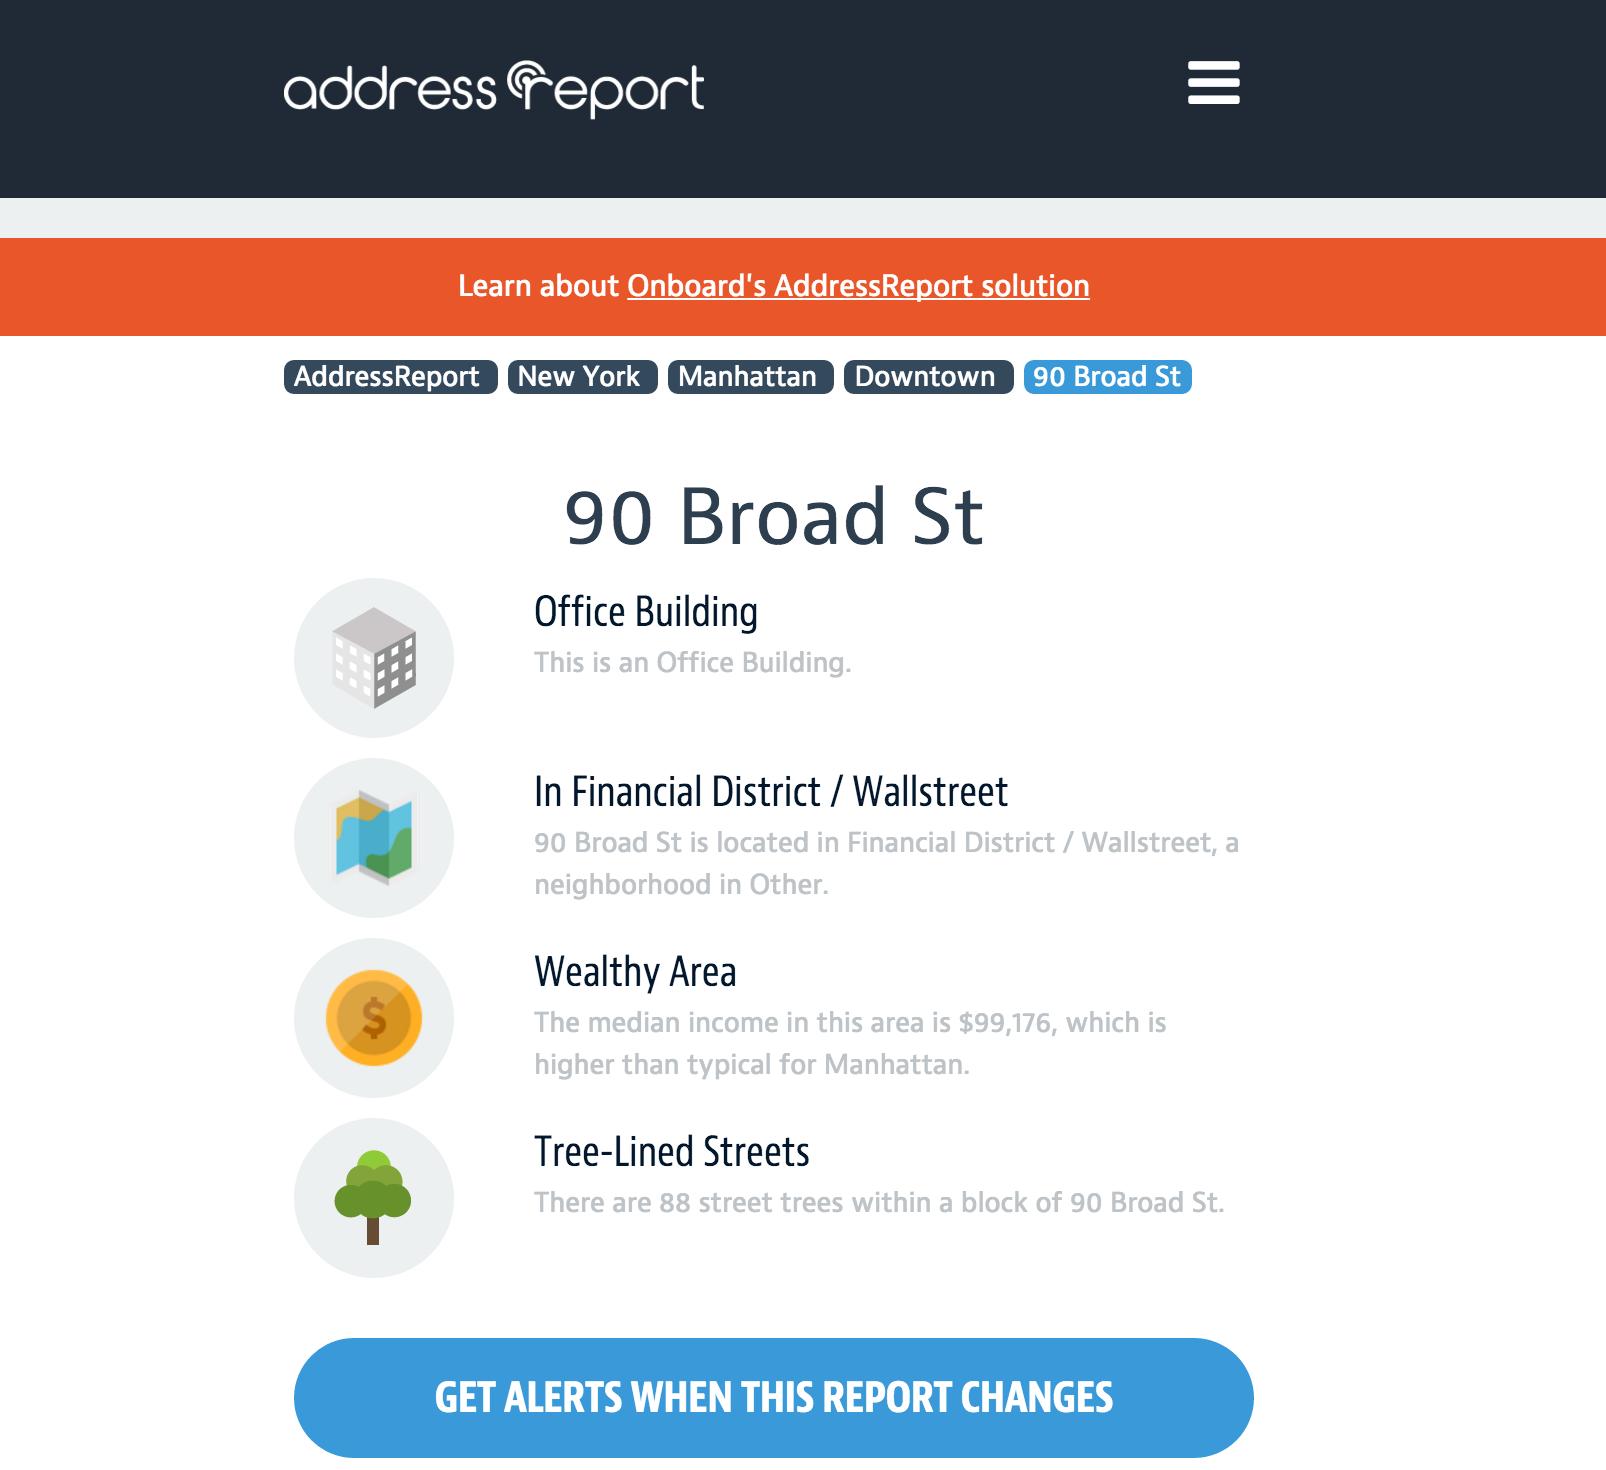 Addressreport